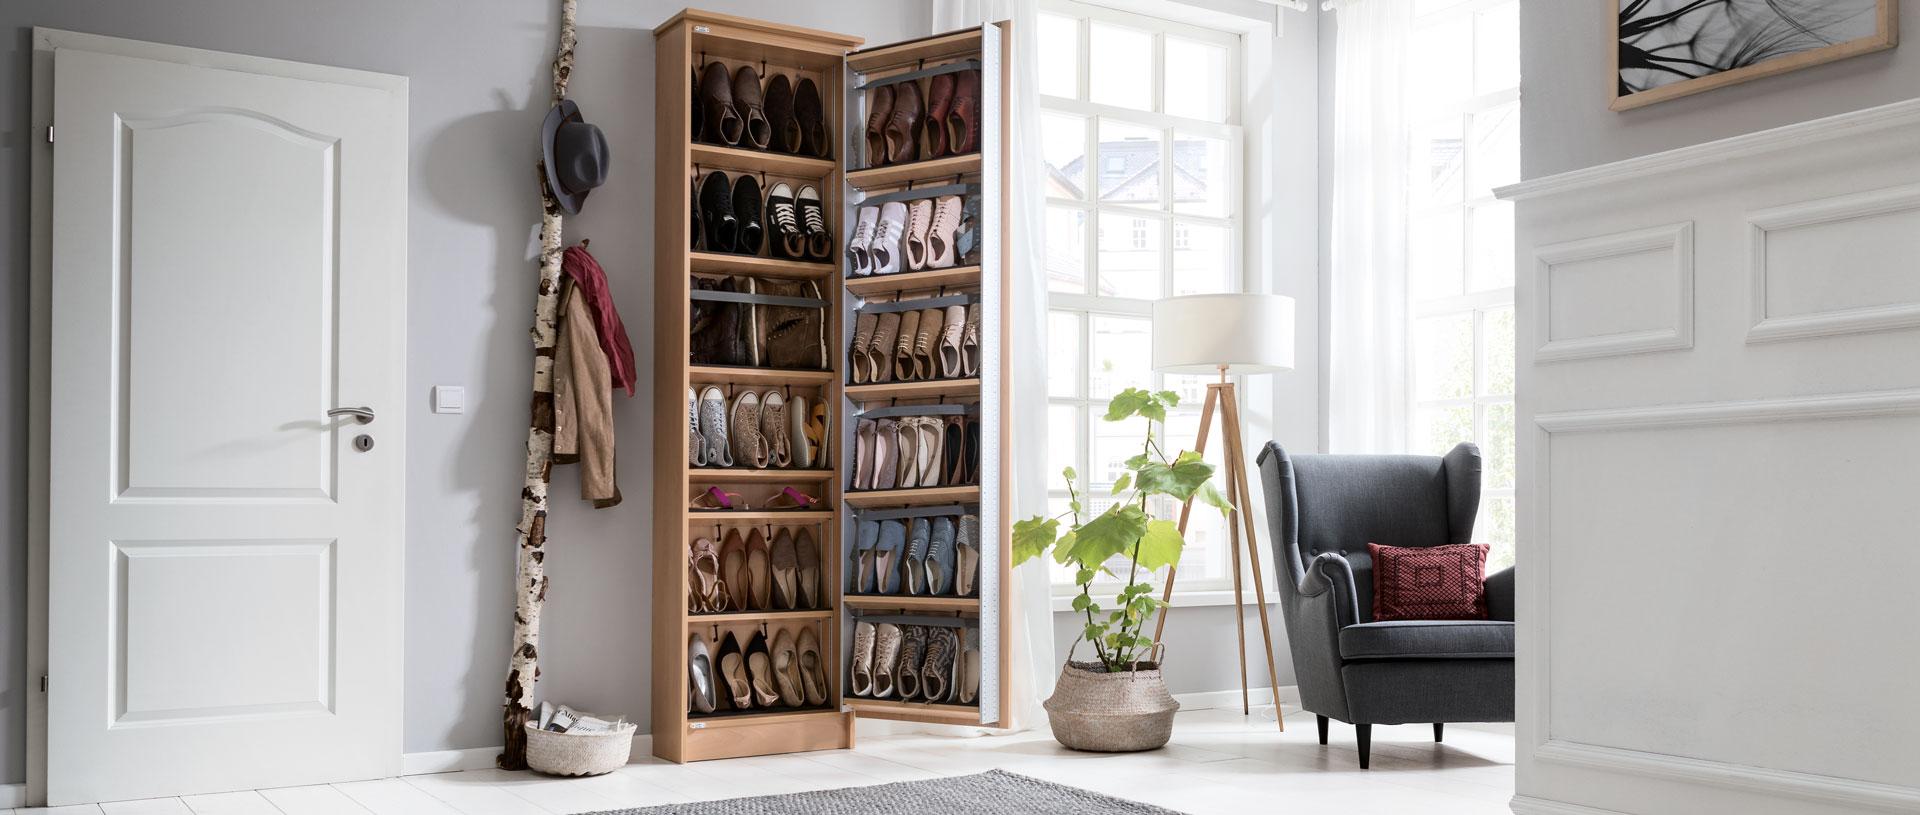 willkommen bei schuhbutler dem perfekten schuhschrank. Black Bedroom Furniture Sets. Home Design Ideas